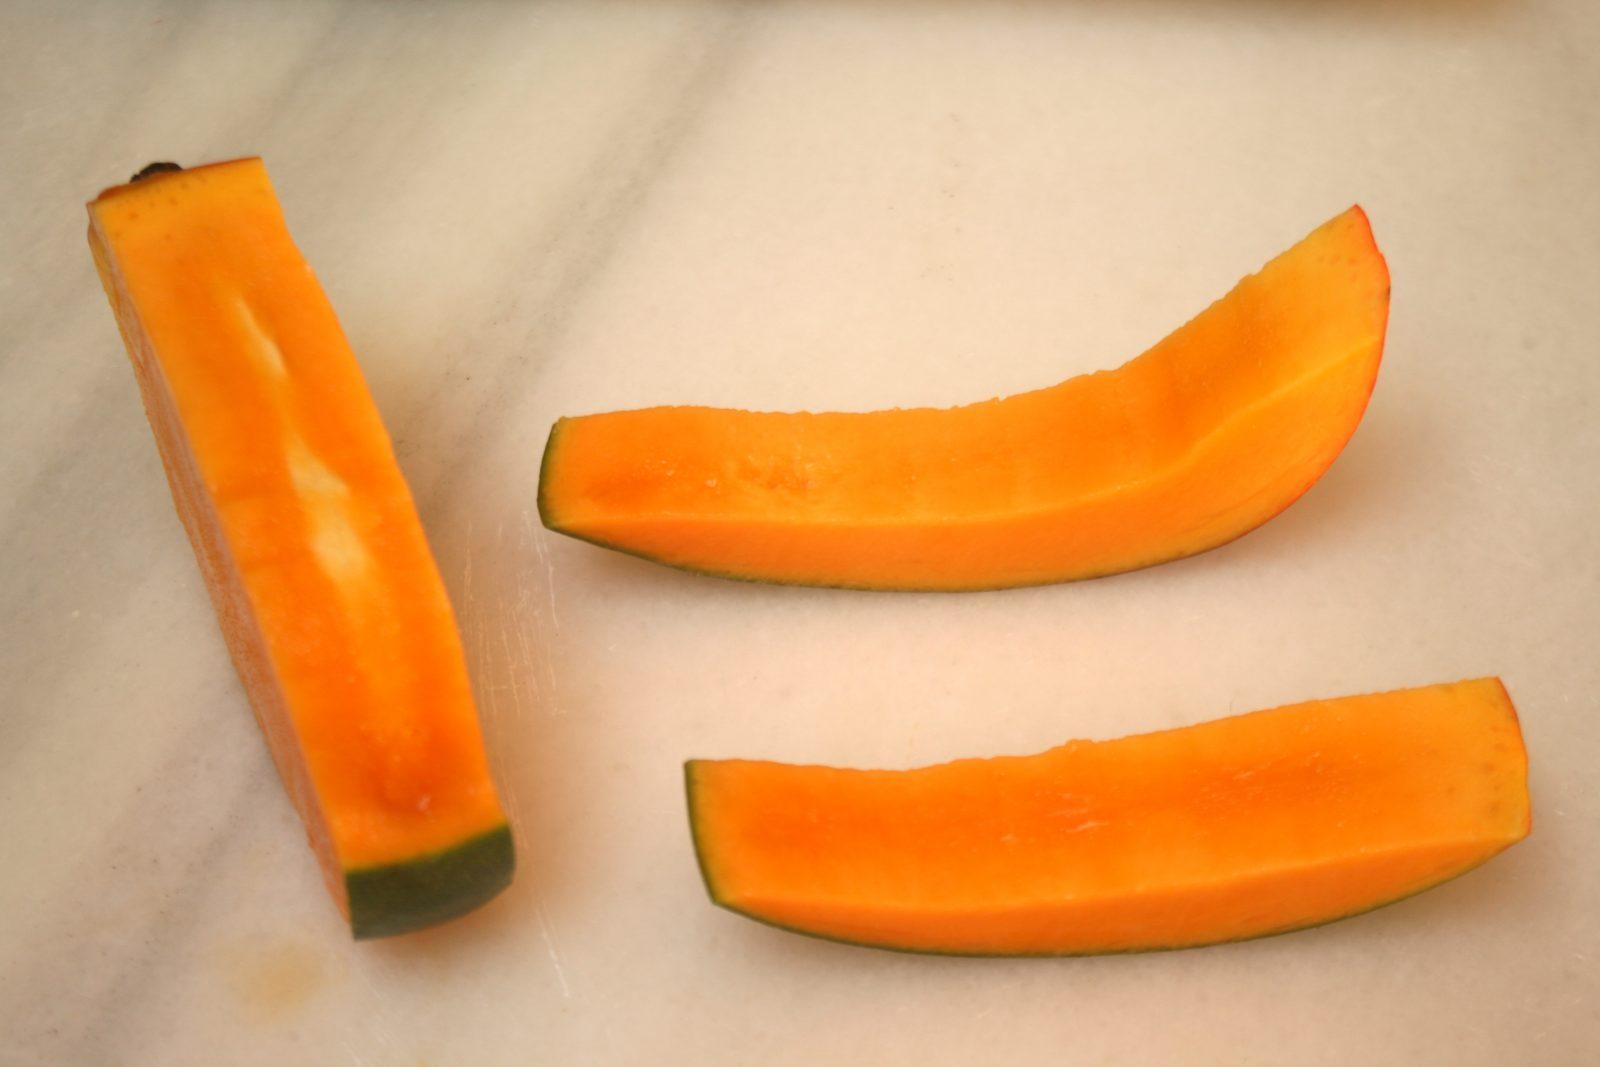 Eat Peel of Mango The Mango You Can Peel